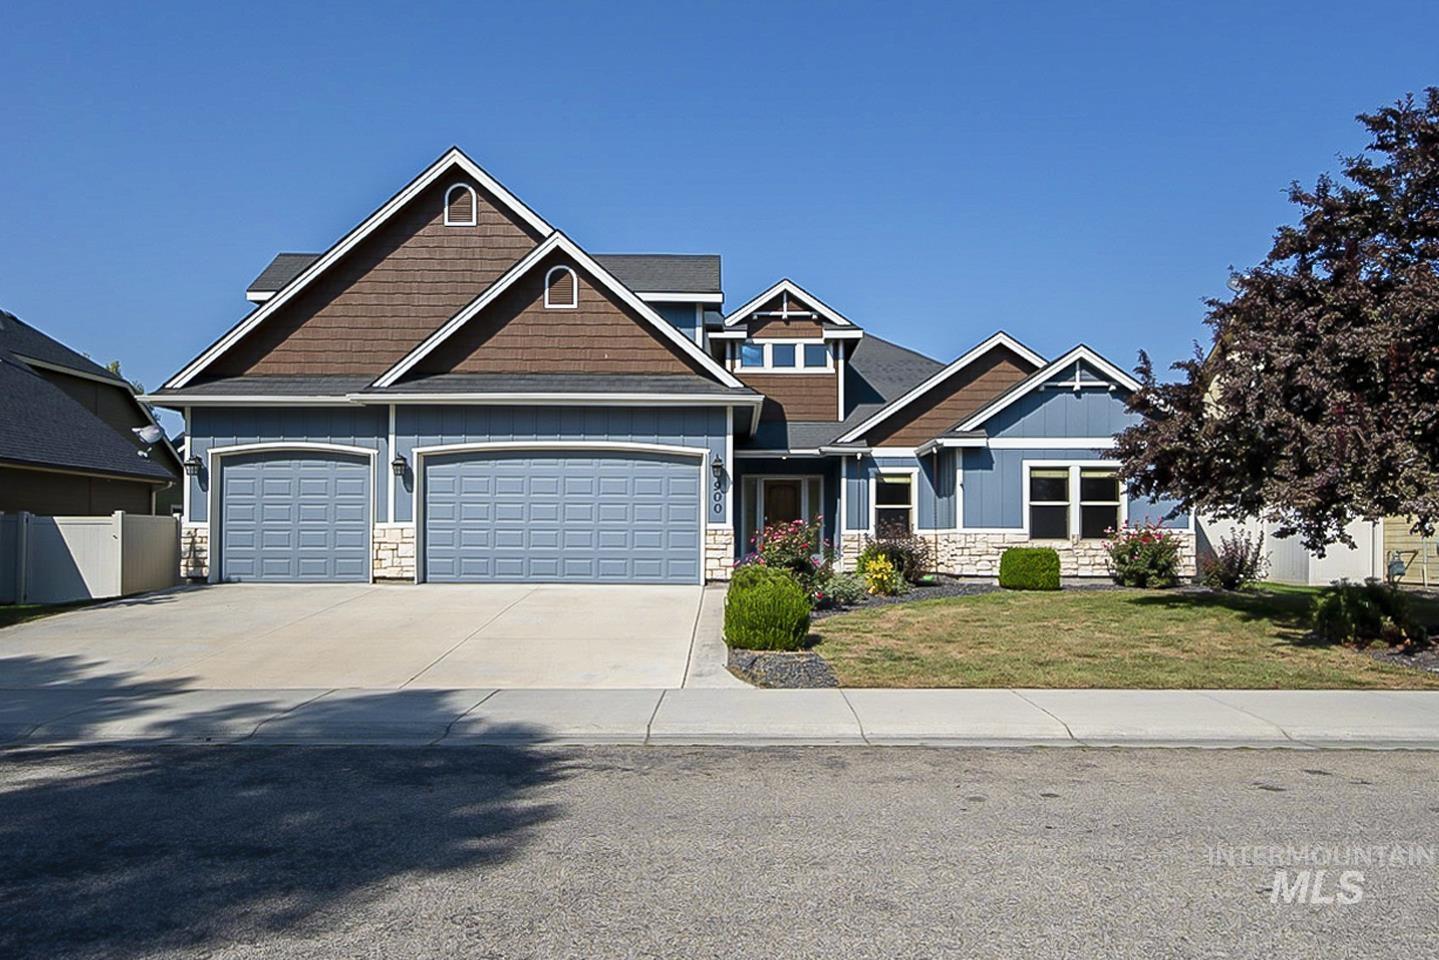 This Meridian one-story home offers granite countertops, and a three-car garage. - Austin Najera, Main: 208-487-8417, Opendoor Brokerage LLC, Main: 480-351-6622,